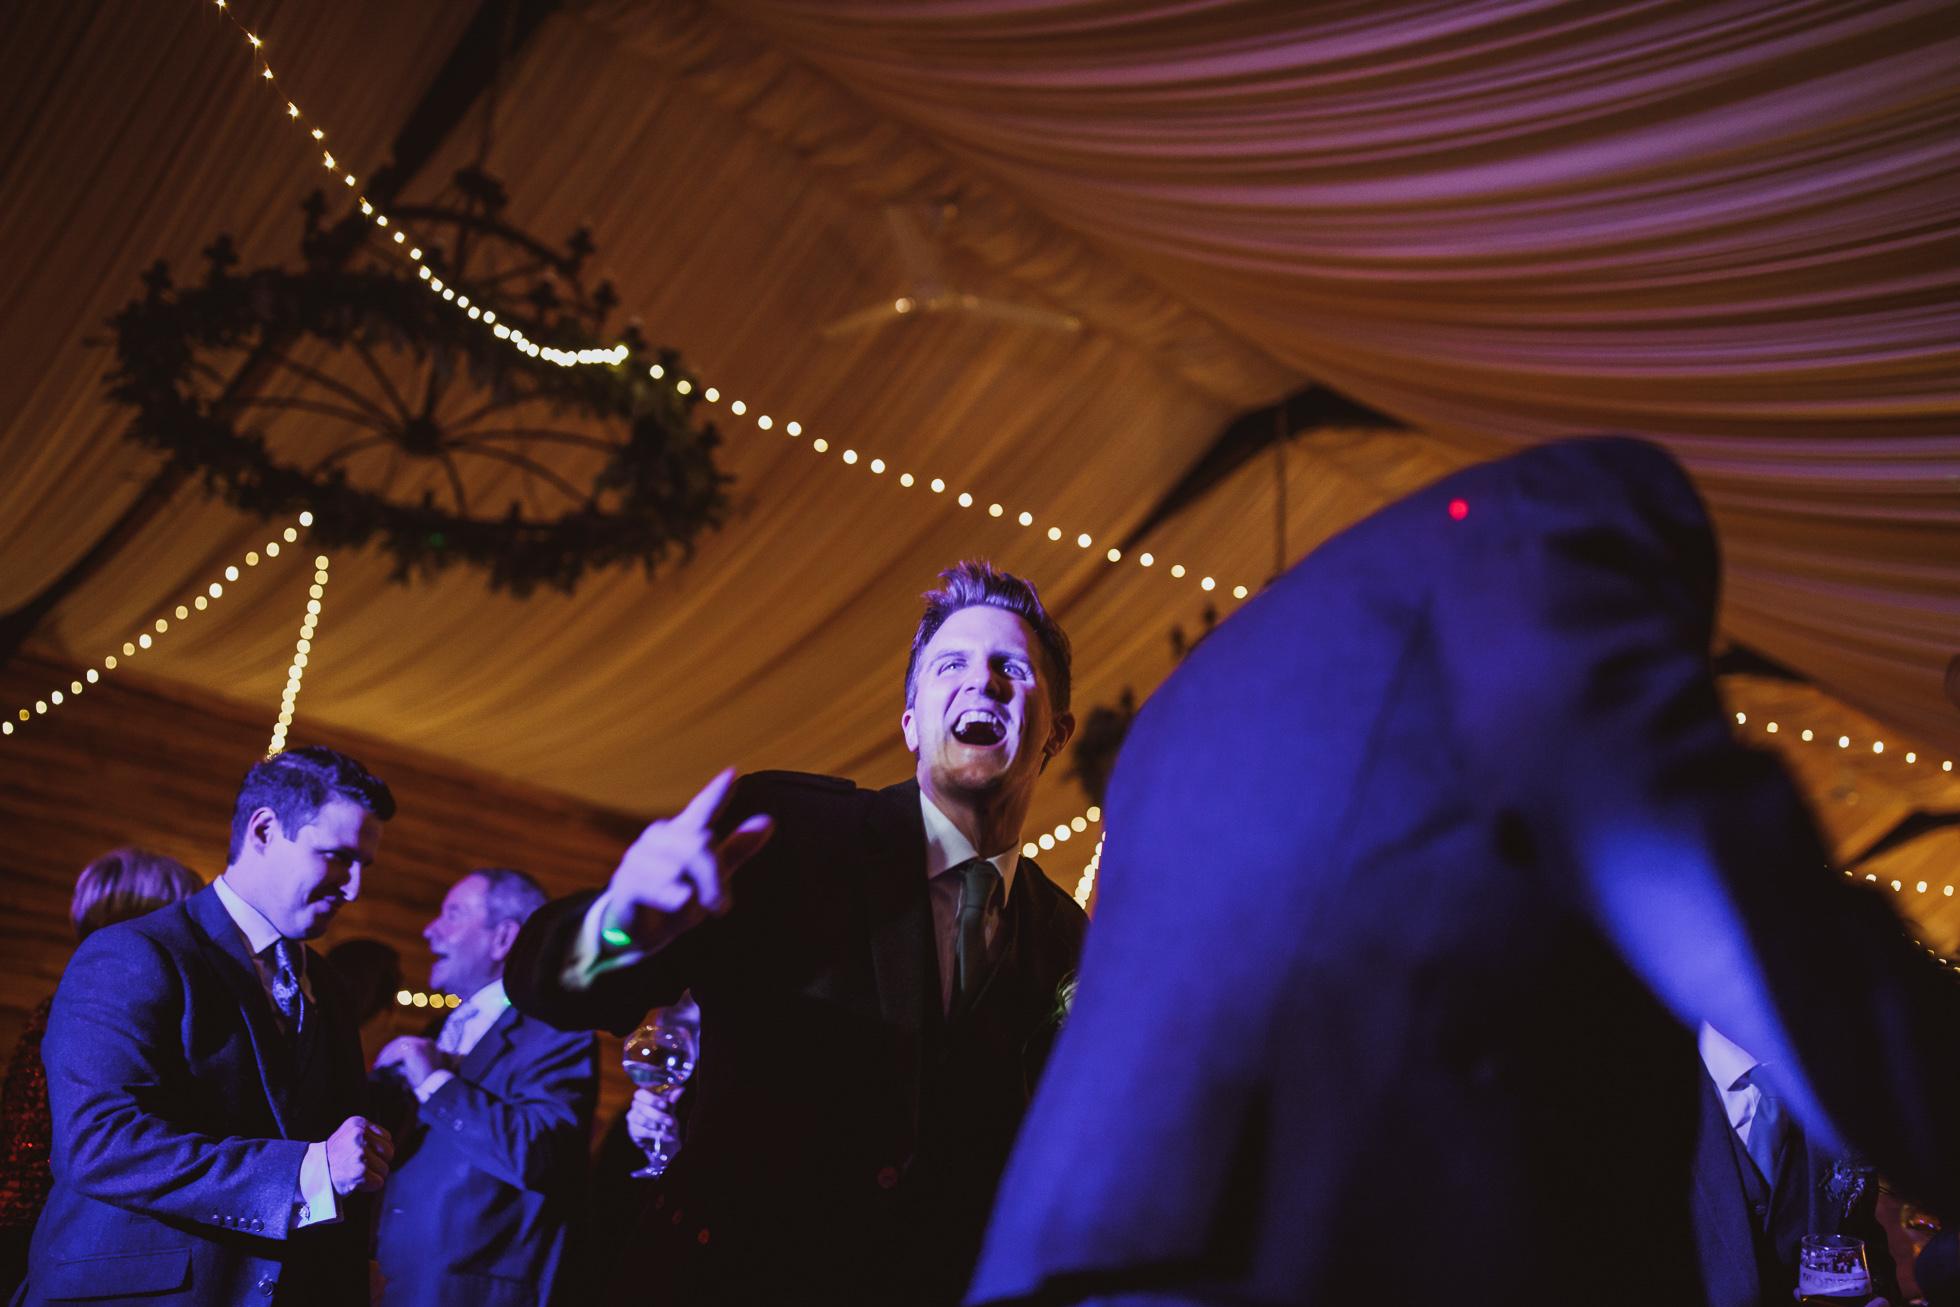 hornington_manor_wedding_photographer-131.jpg